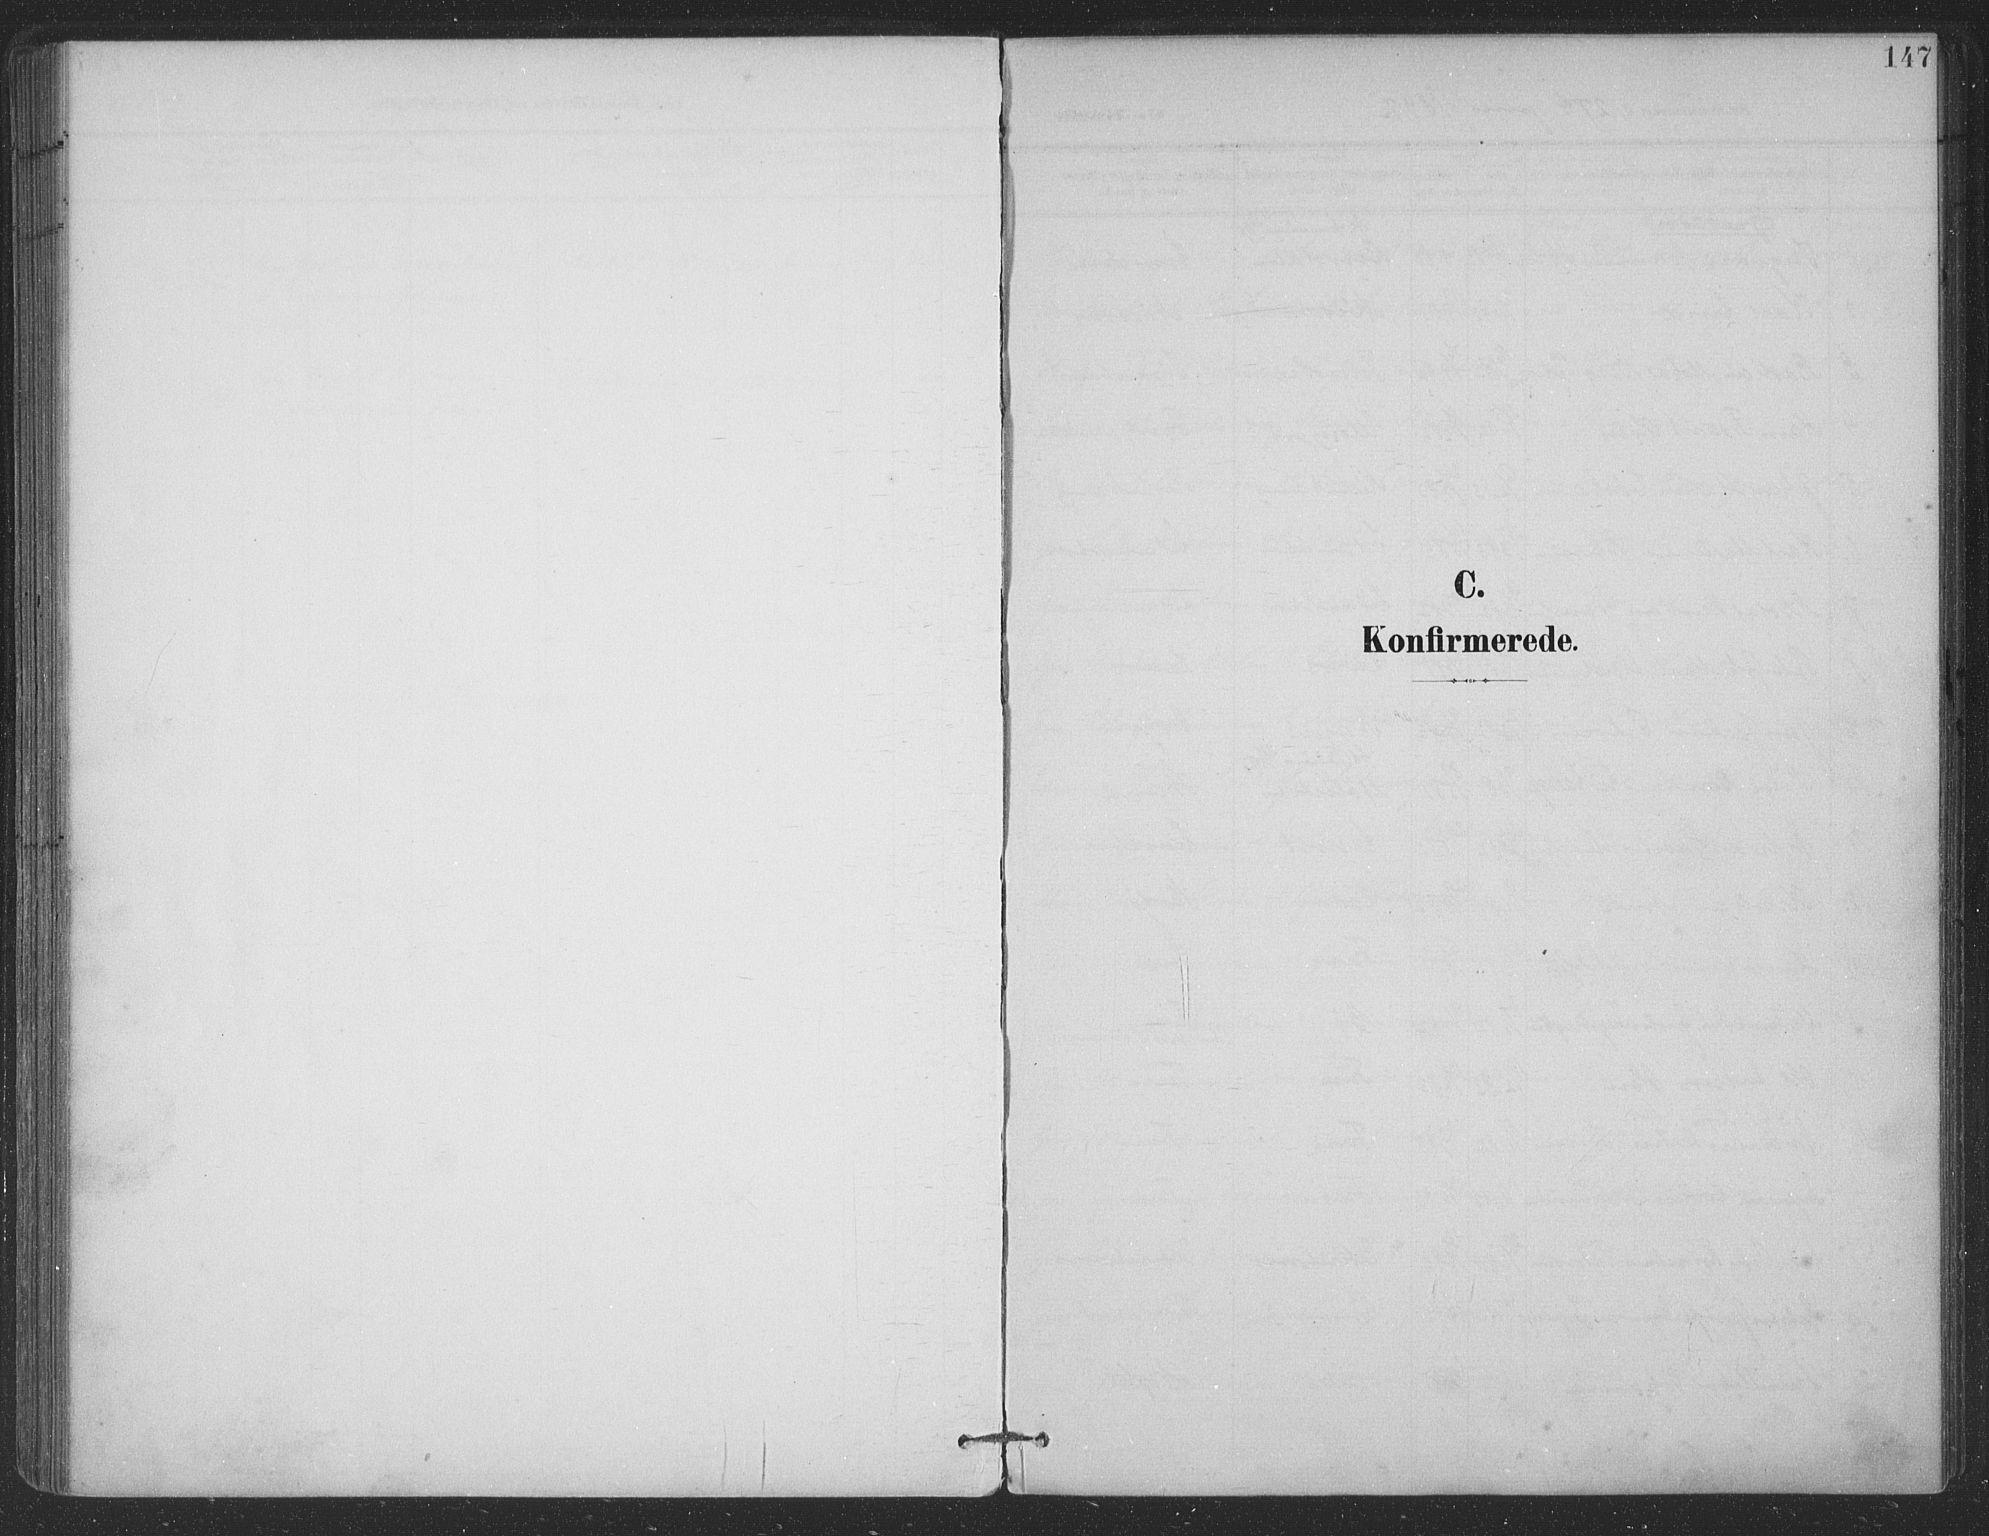 SAT, Ministerialprotokoller, klokkerbøker og fødselsregistre - Nordland, 863/L0899: Ministerialbok nr. 863A11, 1897-1906, s. 147